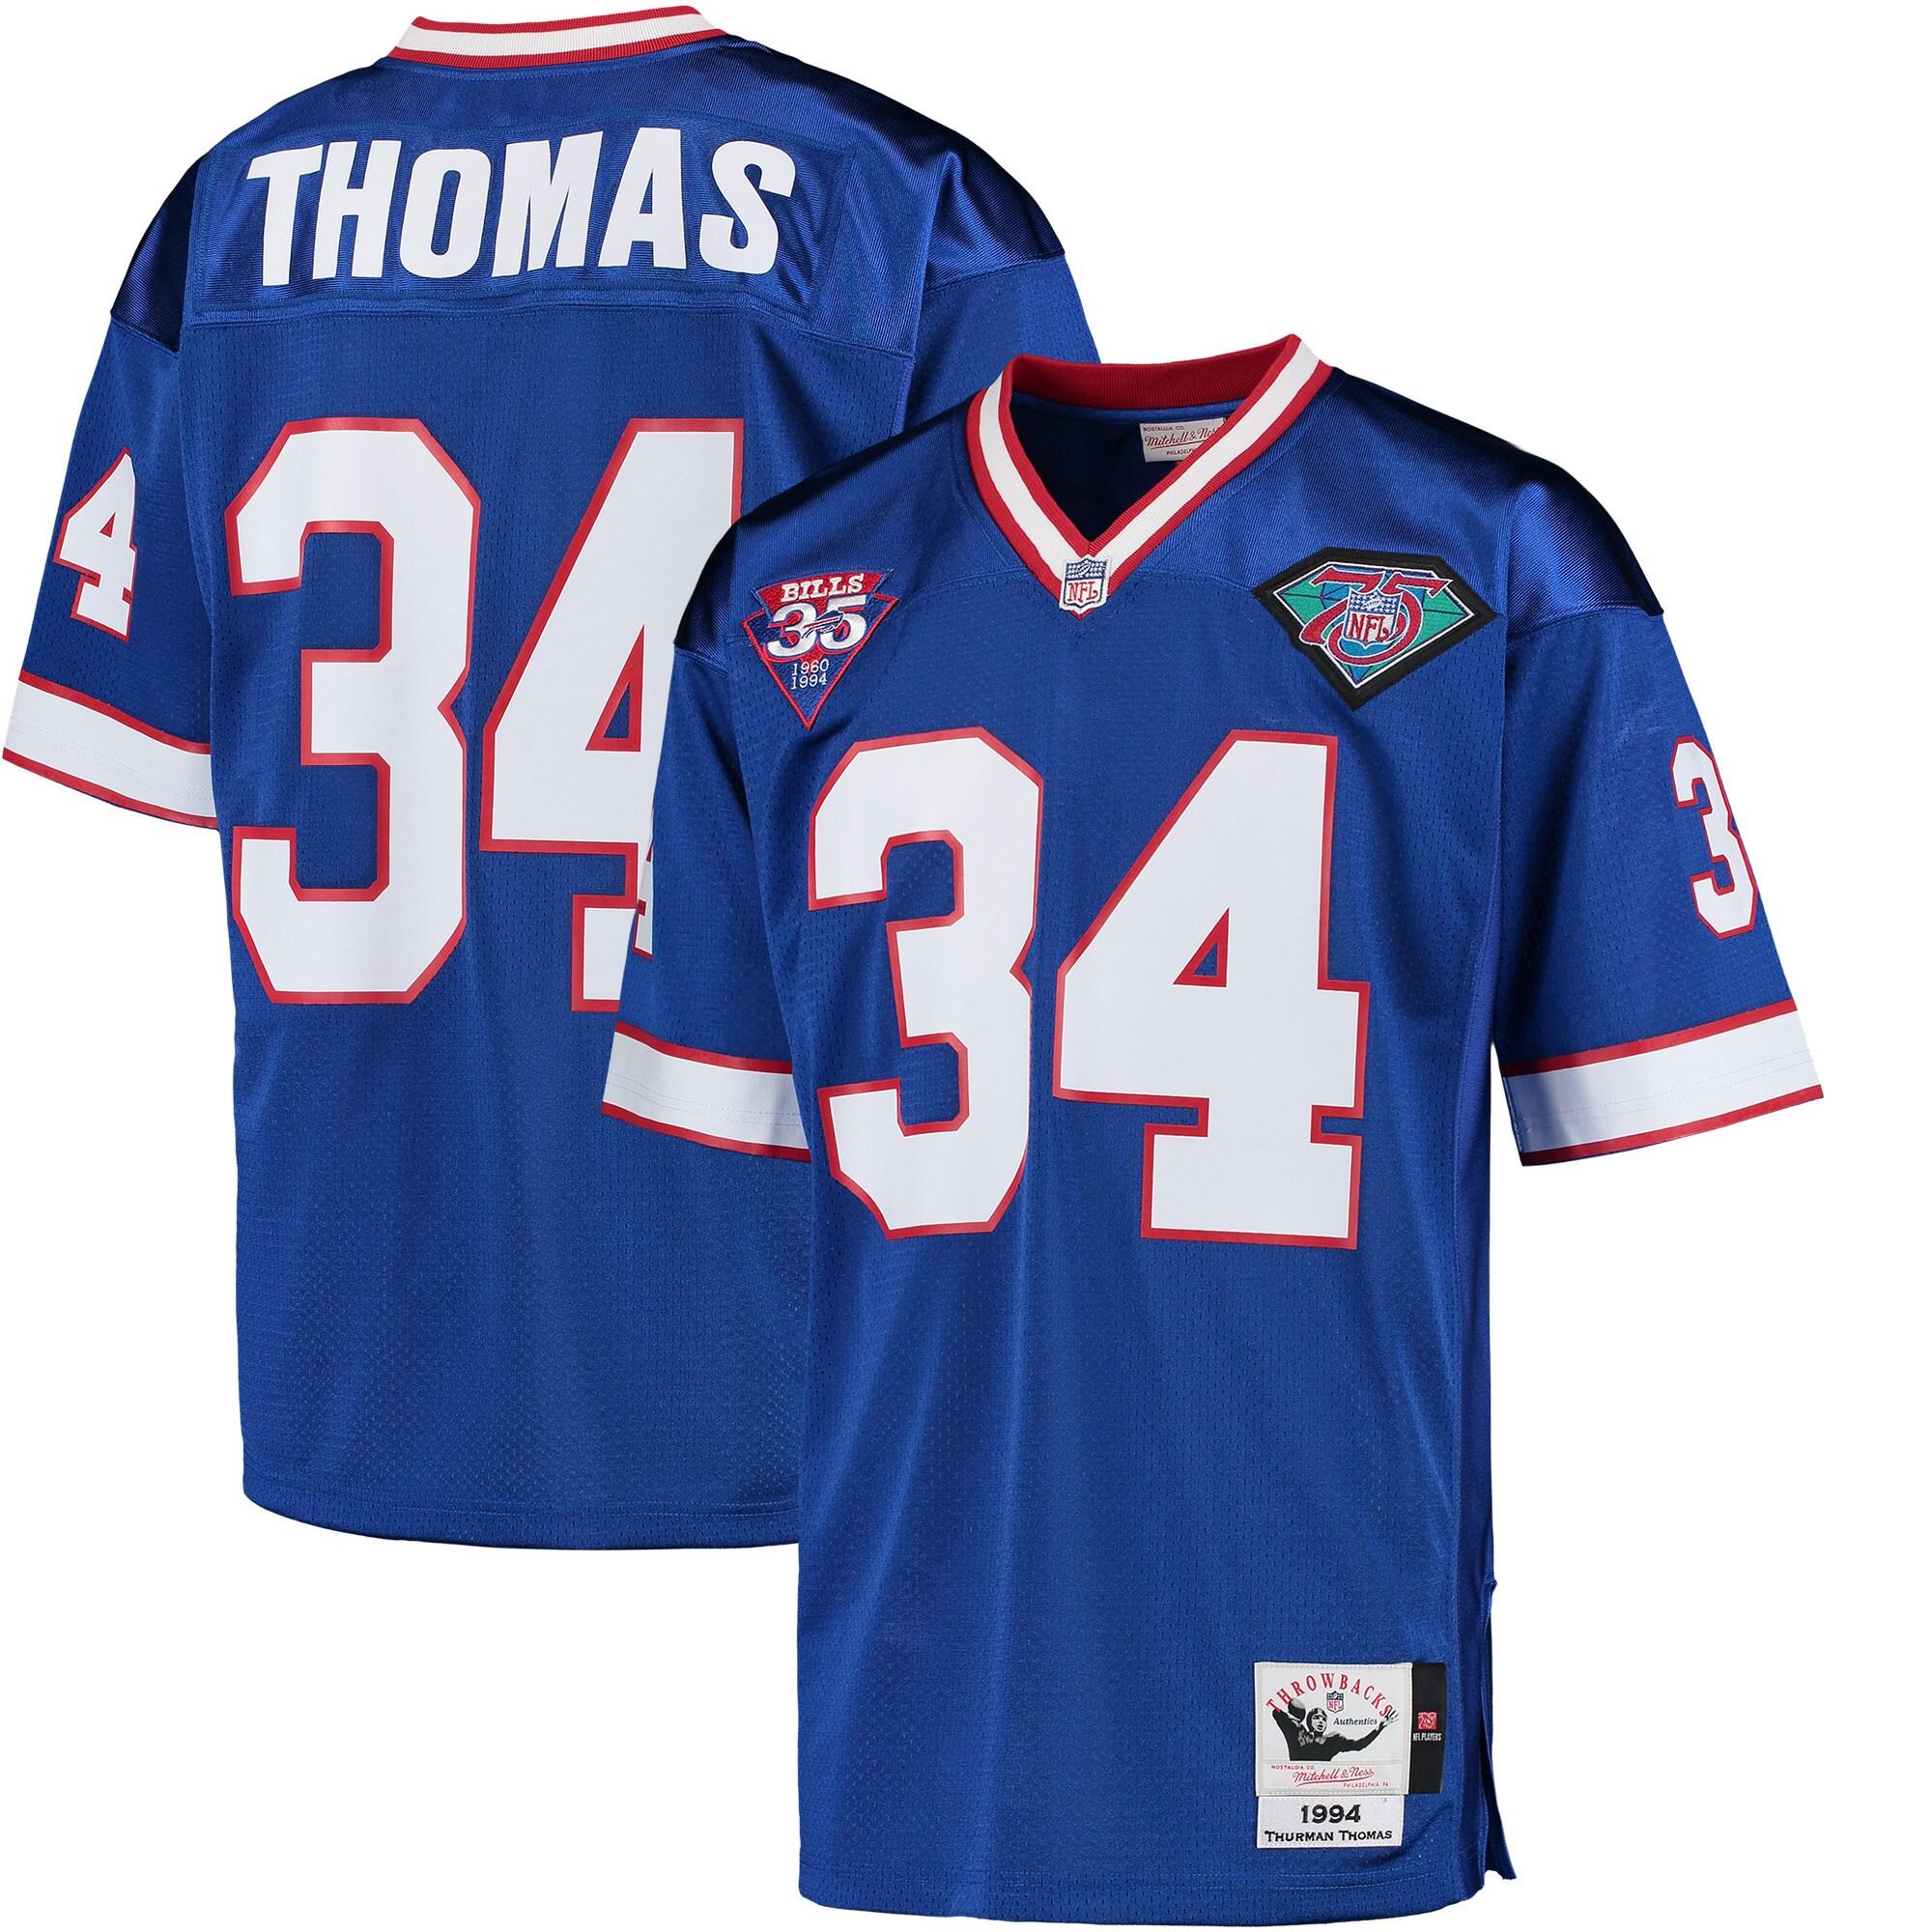 Thurman Thomas Buffalo Bills Mitchell & Ness 1994 35th Anniversary Patch Authentic Throwback Jersey - Royal